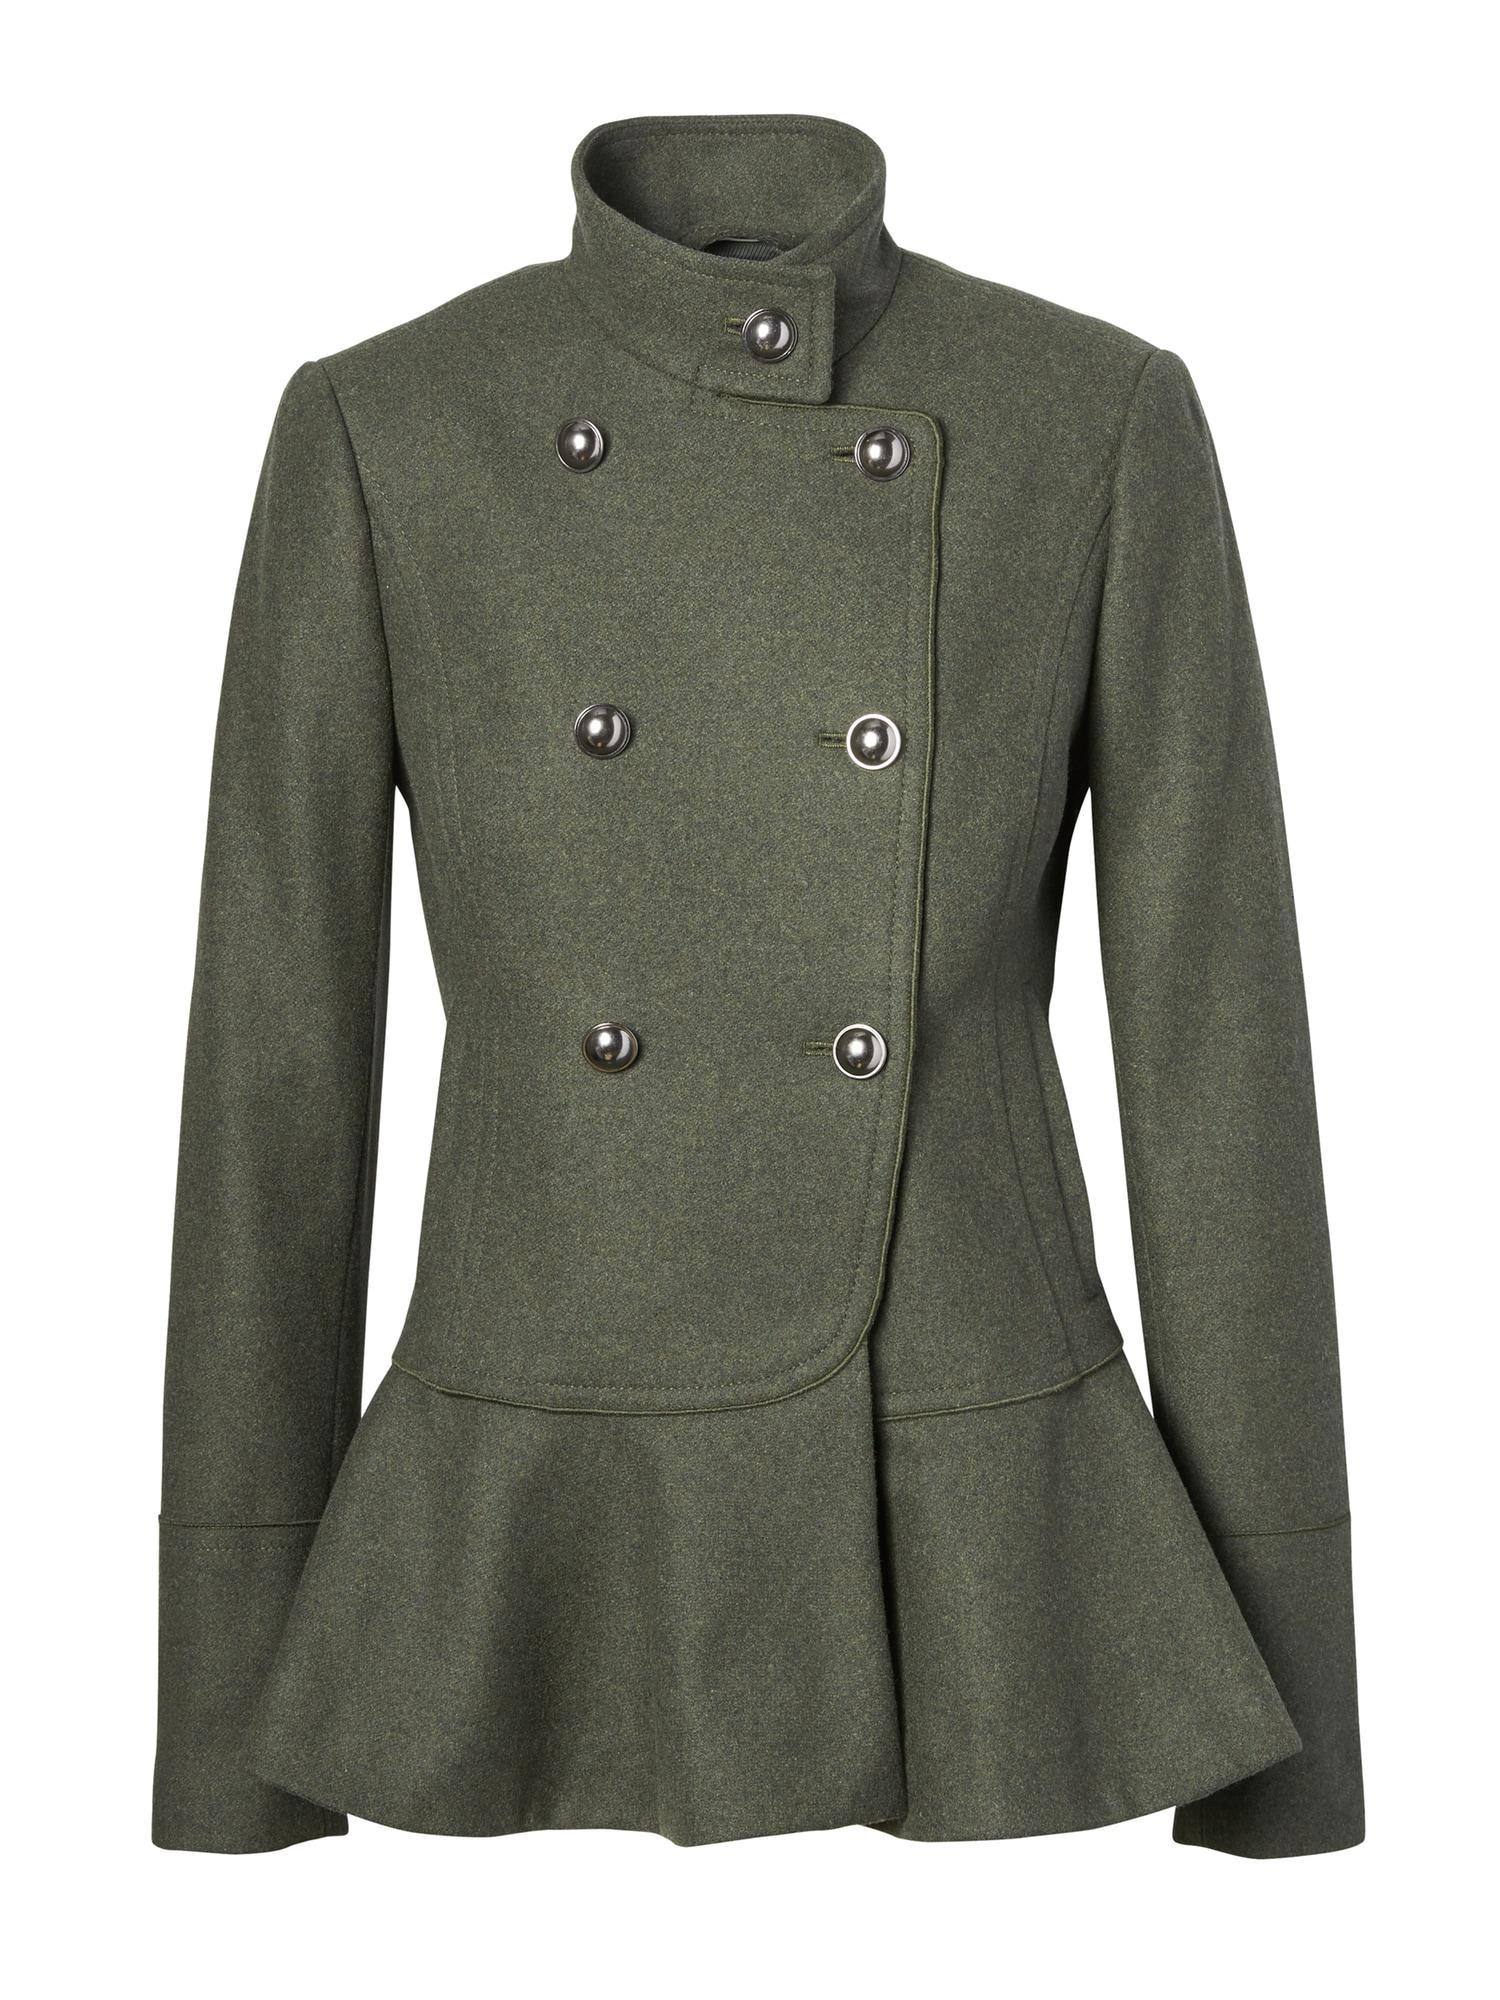 Lyst - Banana Republic Italian Melton Wool-blend Peplum-hem Coat in ... 67bcd1f4f